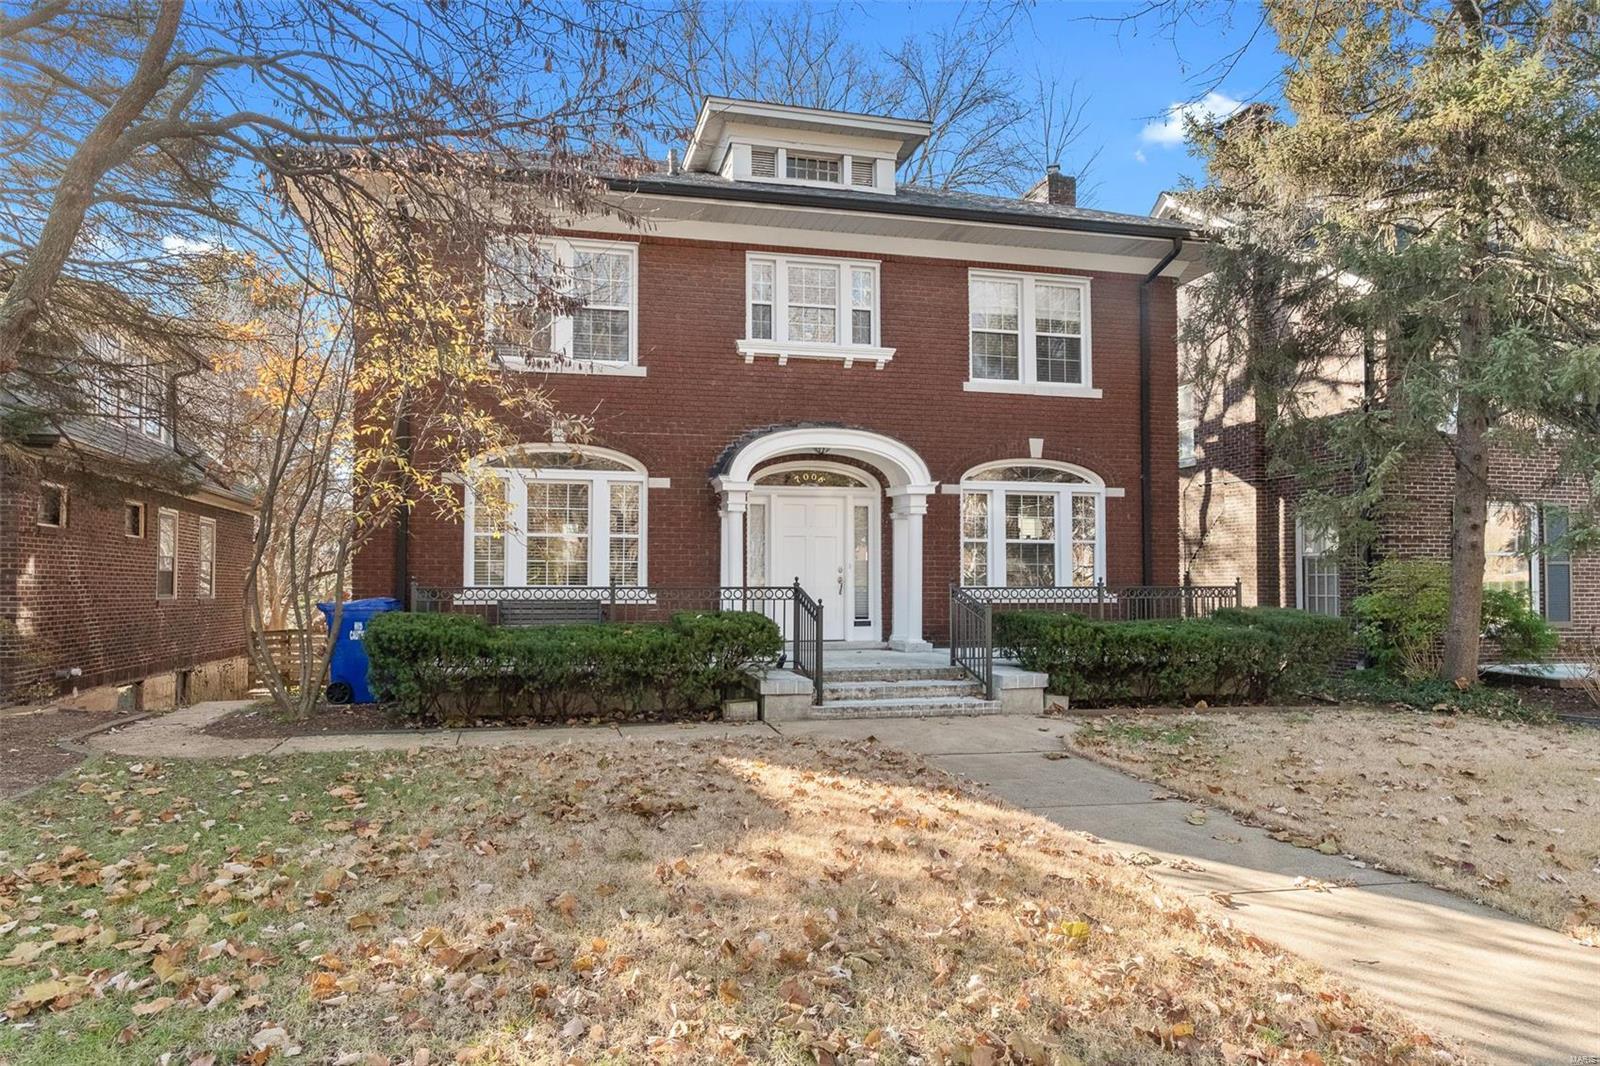 7008 Kingsbury Property Photo - St Louis, MO real estate listing